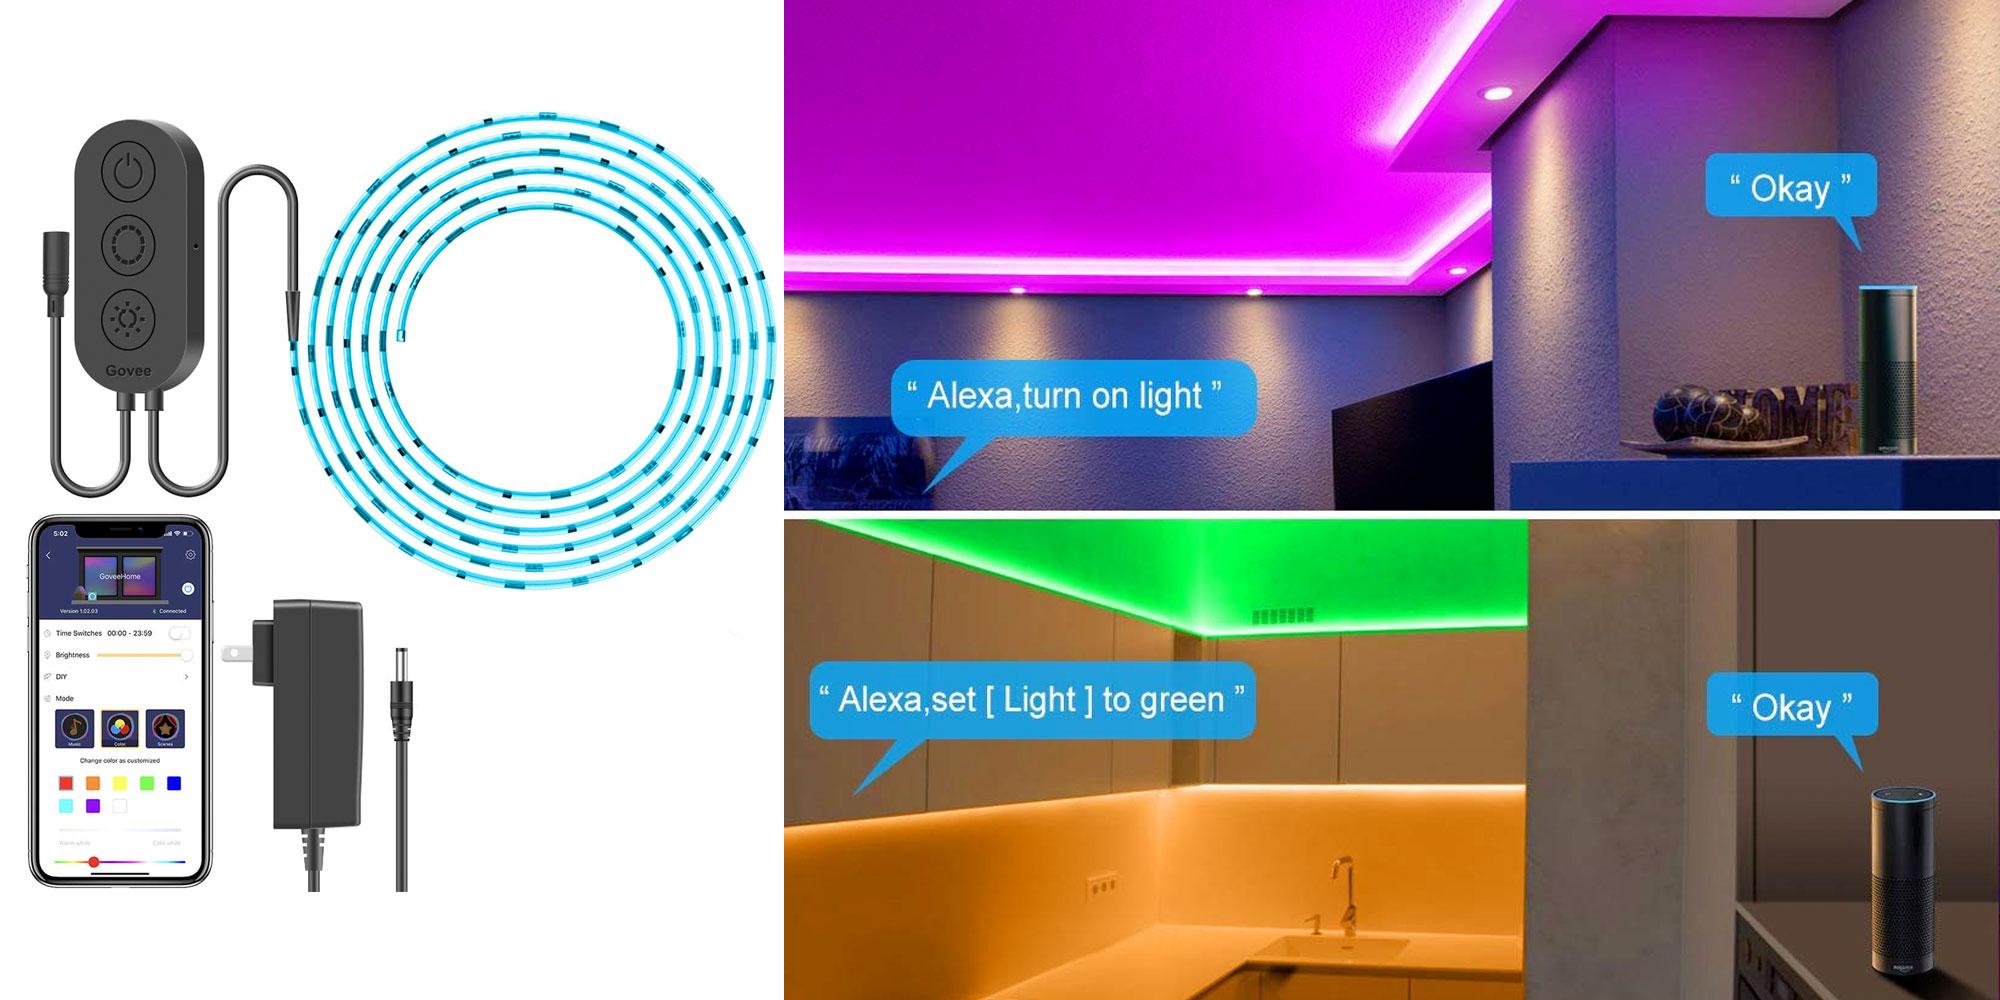 Enjoy Alexa Amp Assistant Control W This Smart Rgb Led